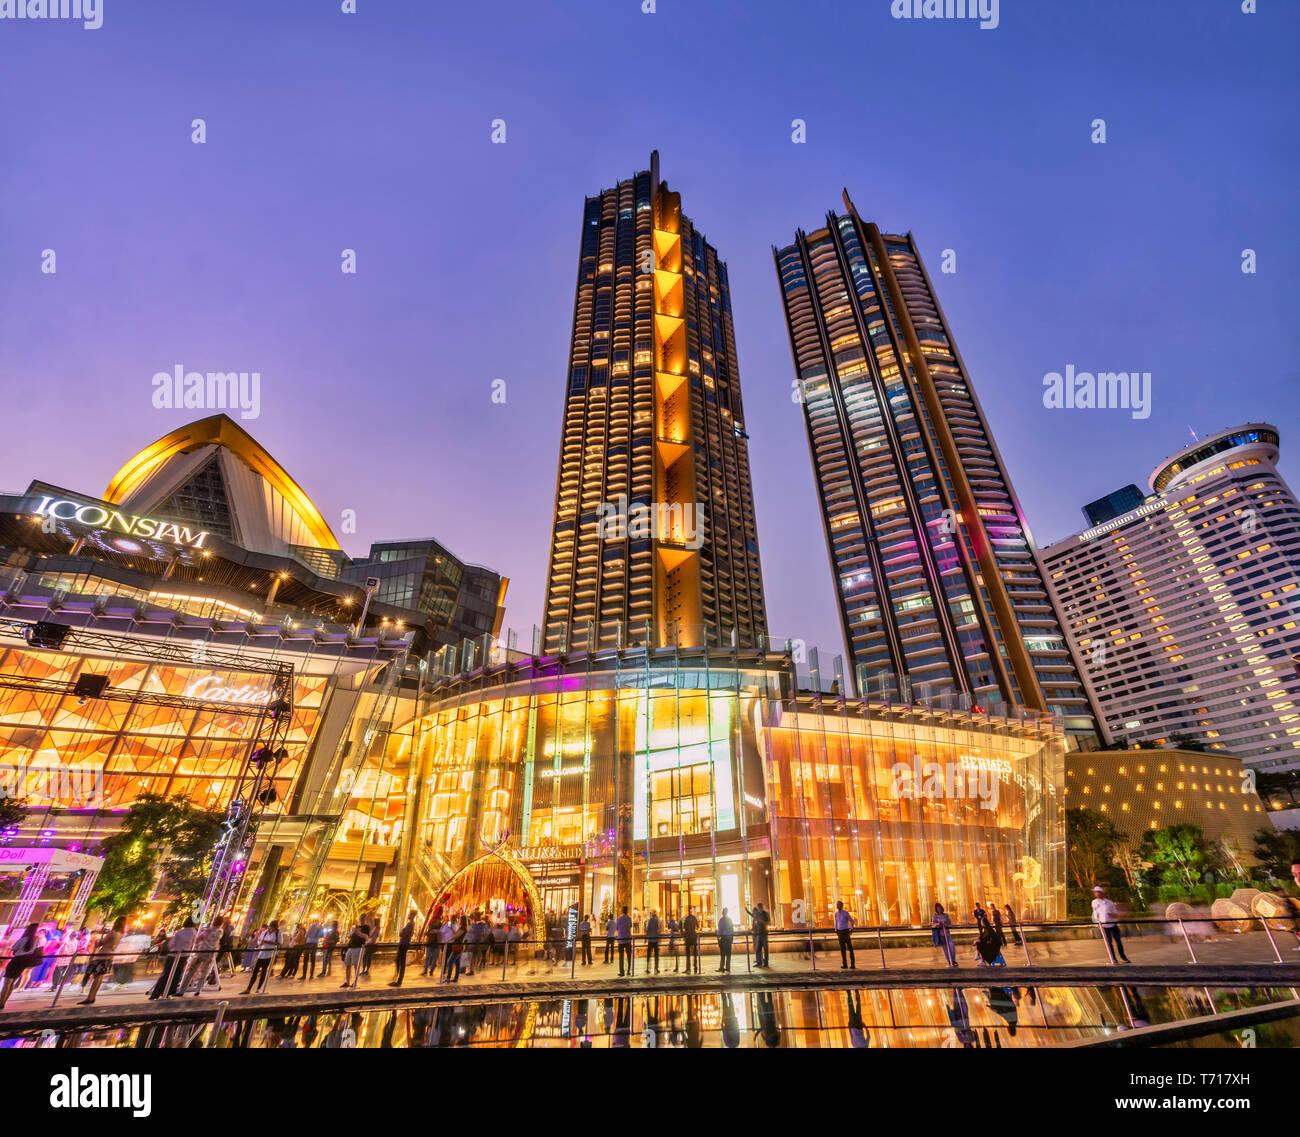 Icon Siam mall,  shopping mall , twilight, Bangkok, Thailand - Stock Image